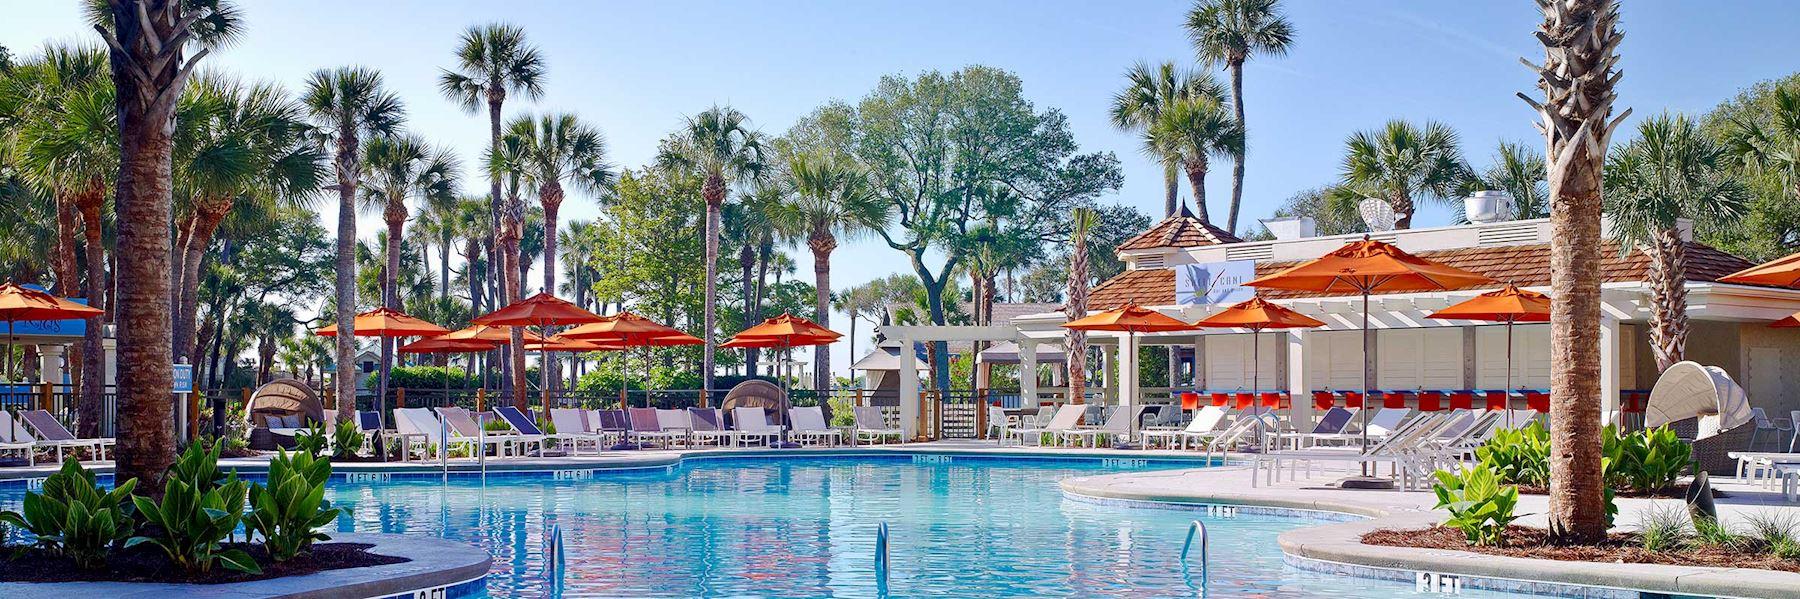 Hilton Head Resorts >> Sonesta Resort Hilton Head Island Audley Travel